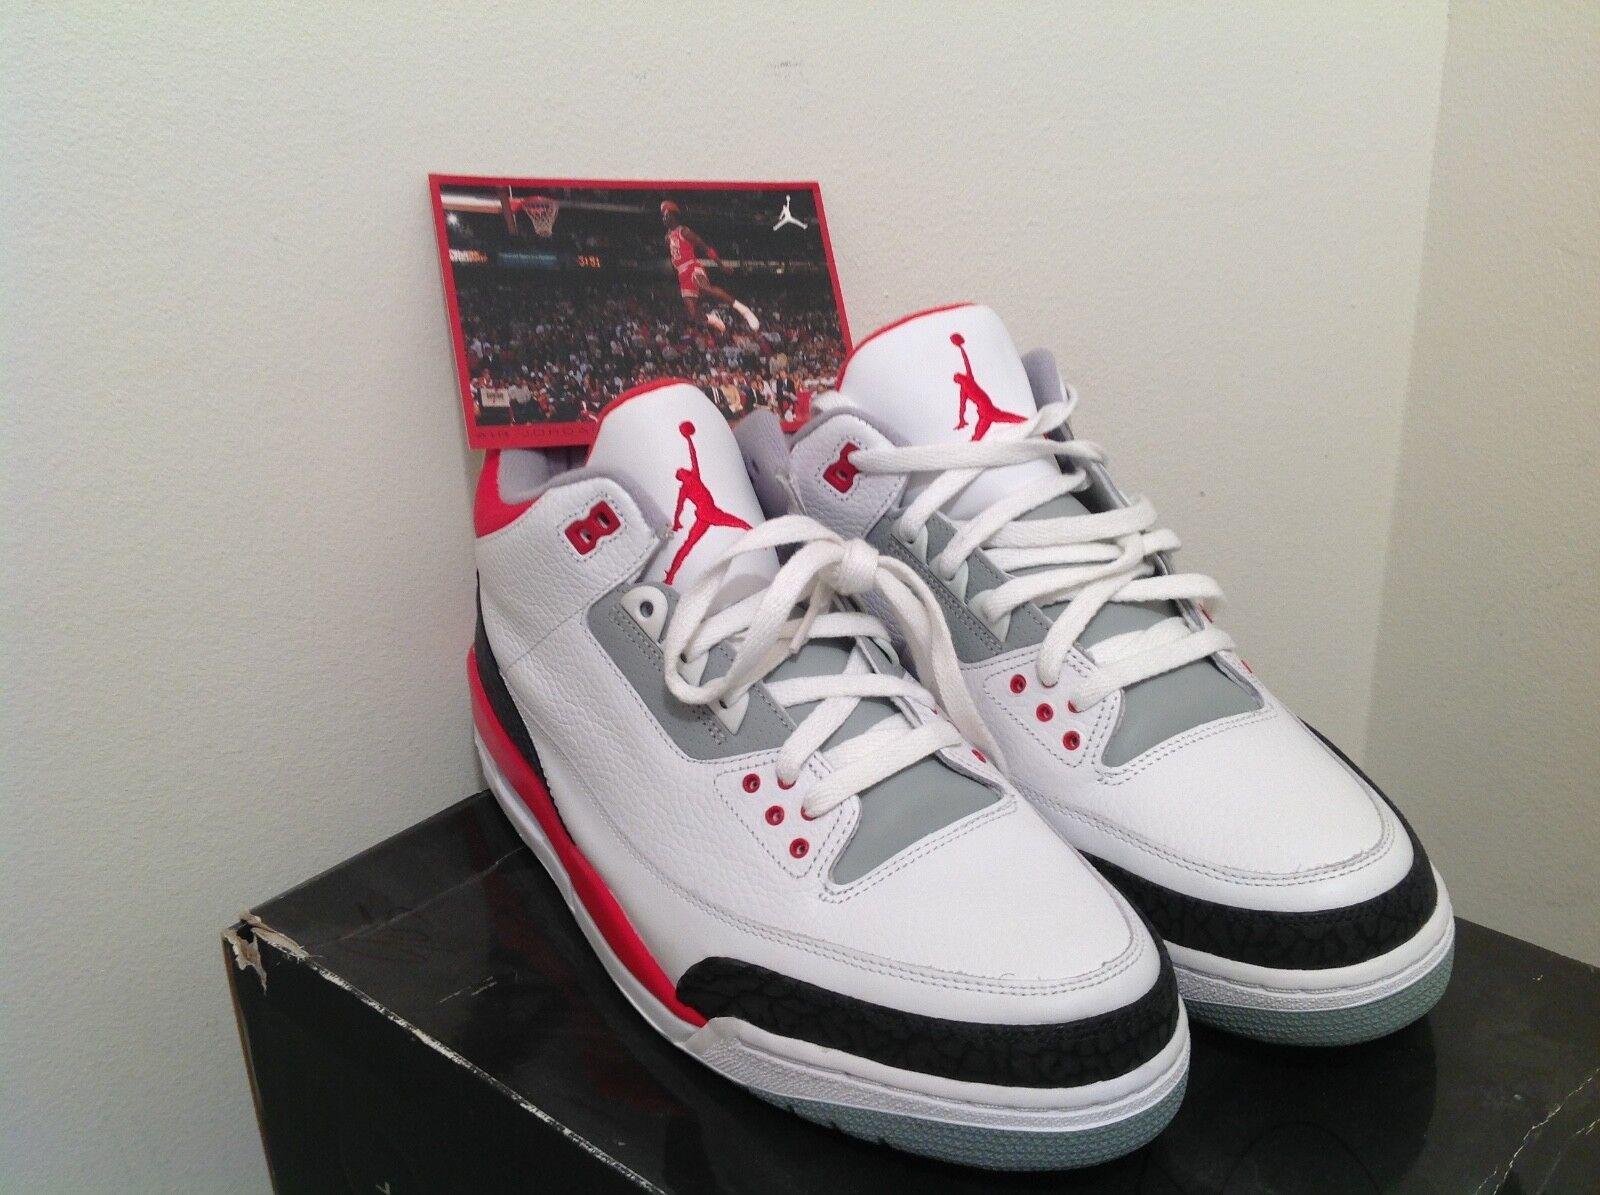 AIR Jordan 3 Retro White Fire Red-Cem Grey Size 13 136064-161 brand NEW   Xi III